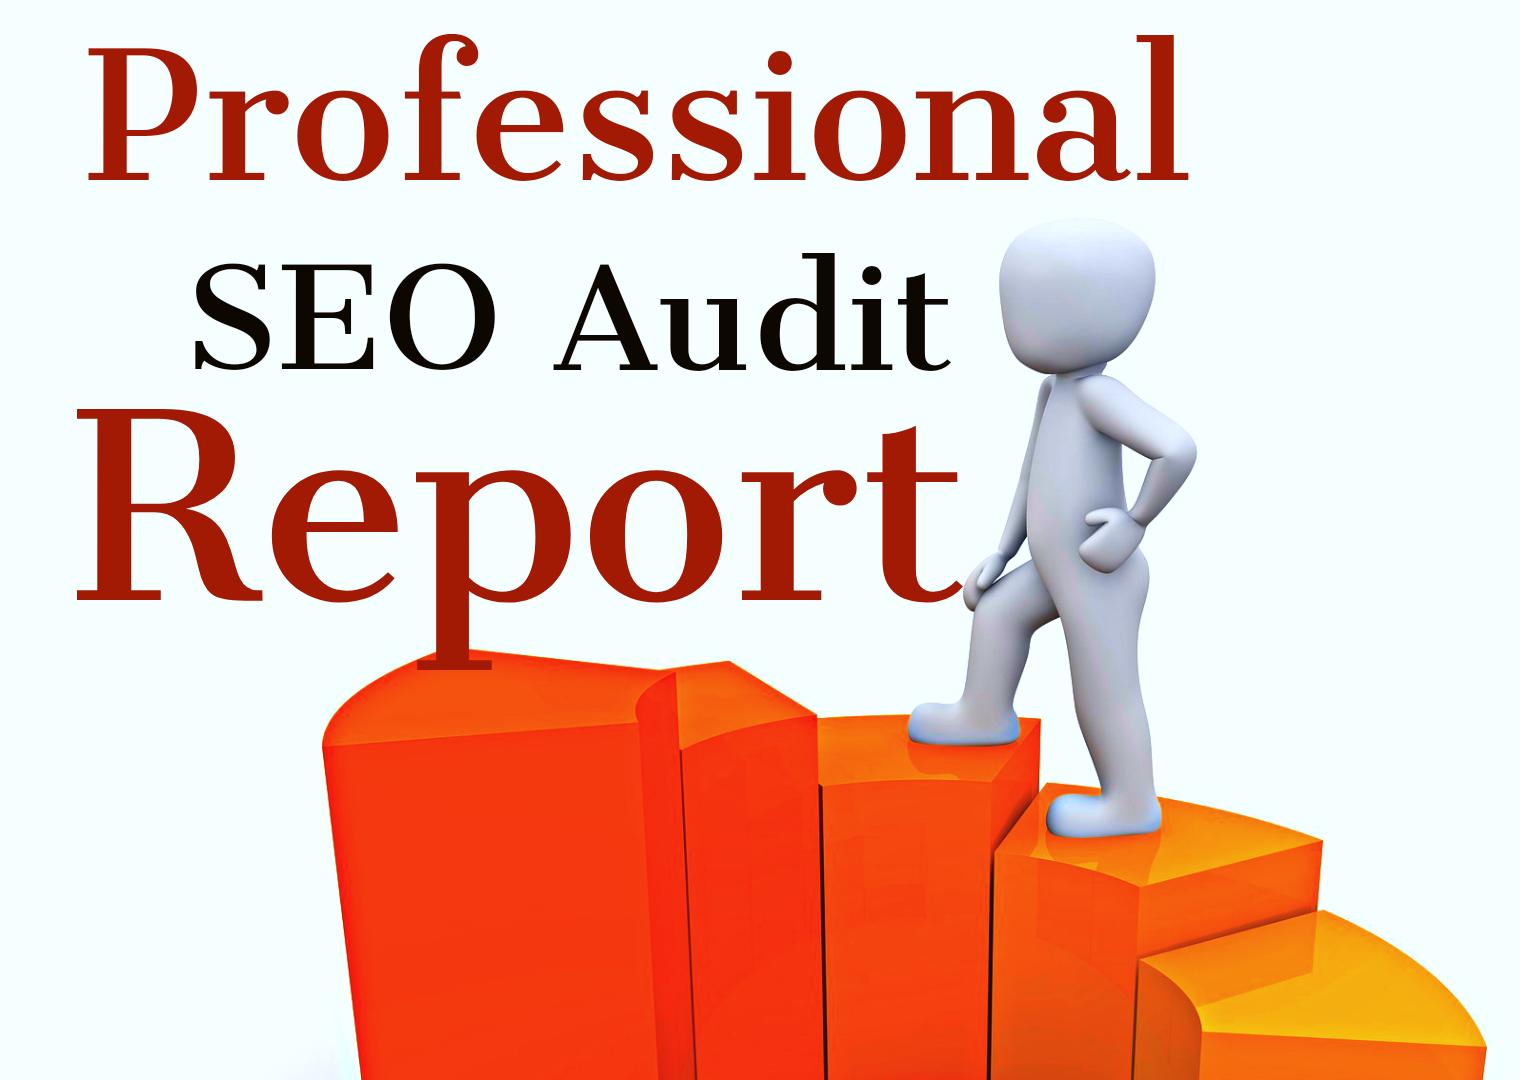 Get Professional SEO Audit Report